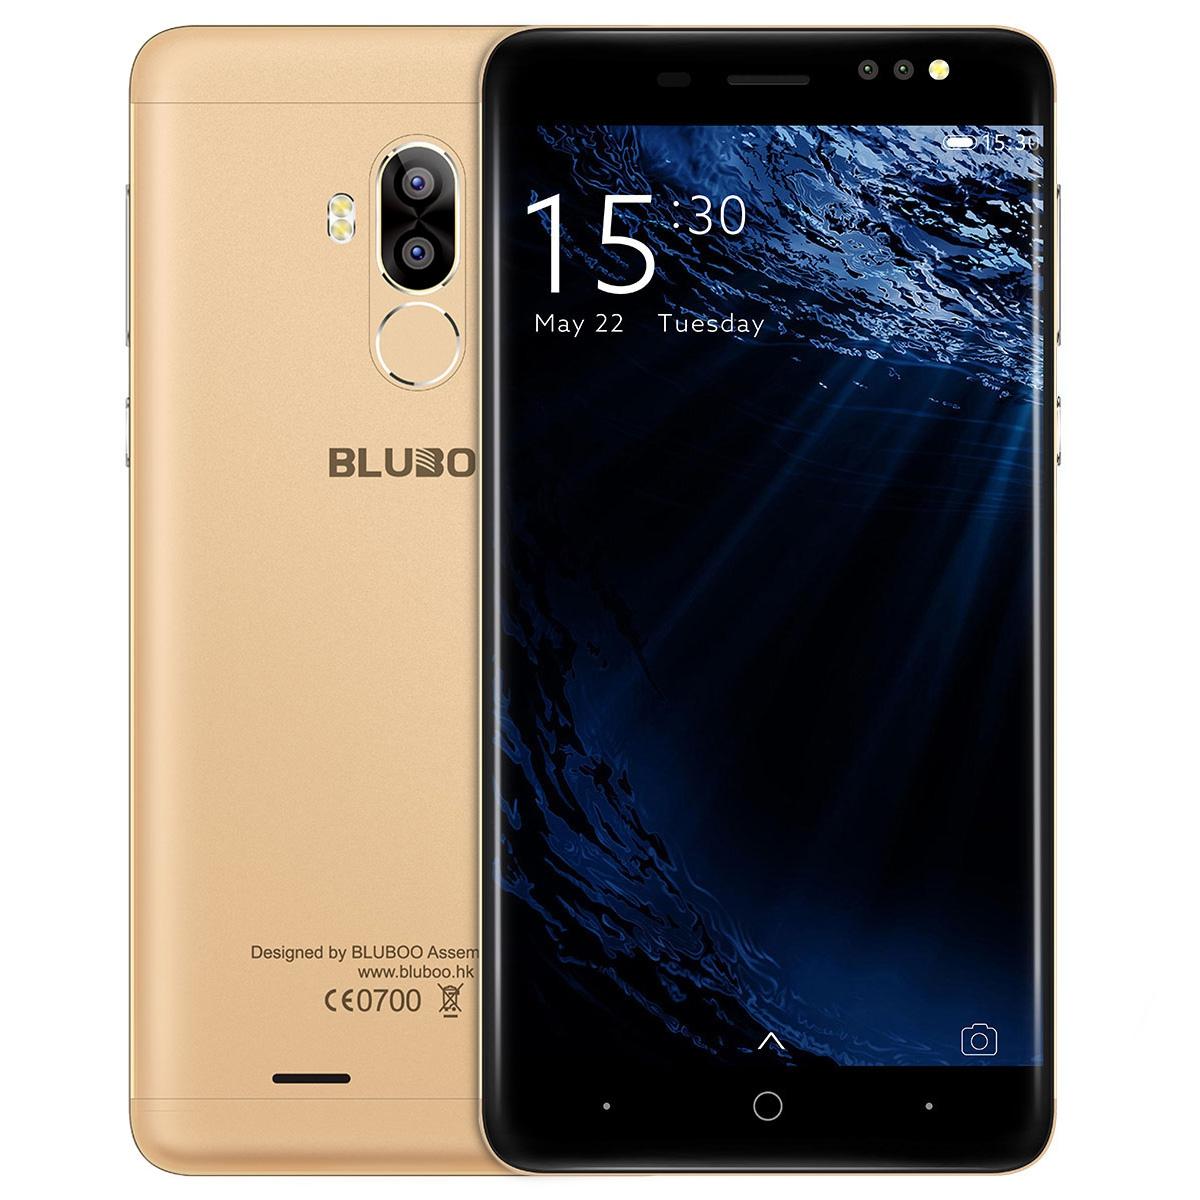 BLUBOO Шампанское Золотое Стандарт ЕС bluboo d2 3g smartphone 1gb ram 8gb rom двойные задние камеры 5 2 дюймовый android 6 0 quad core mtk6580a